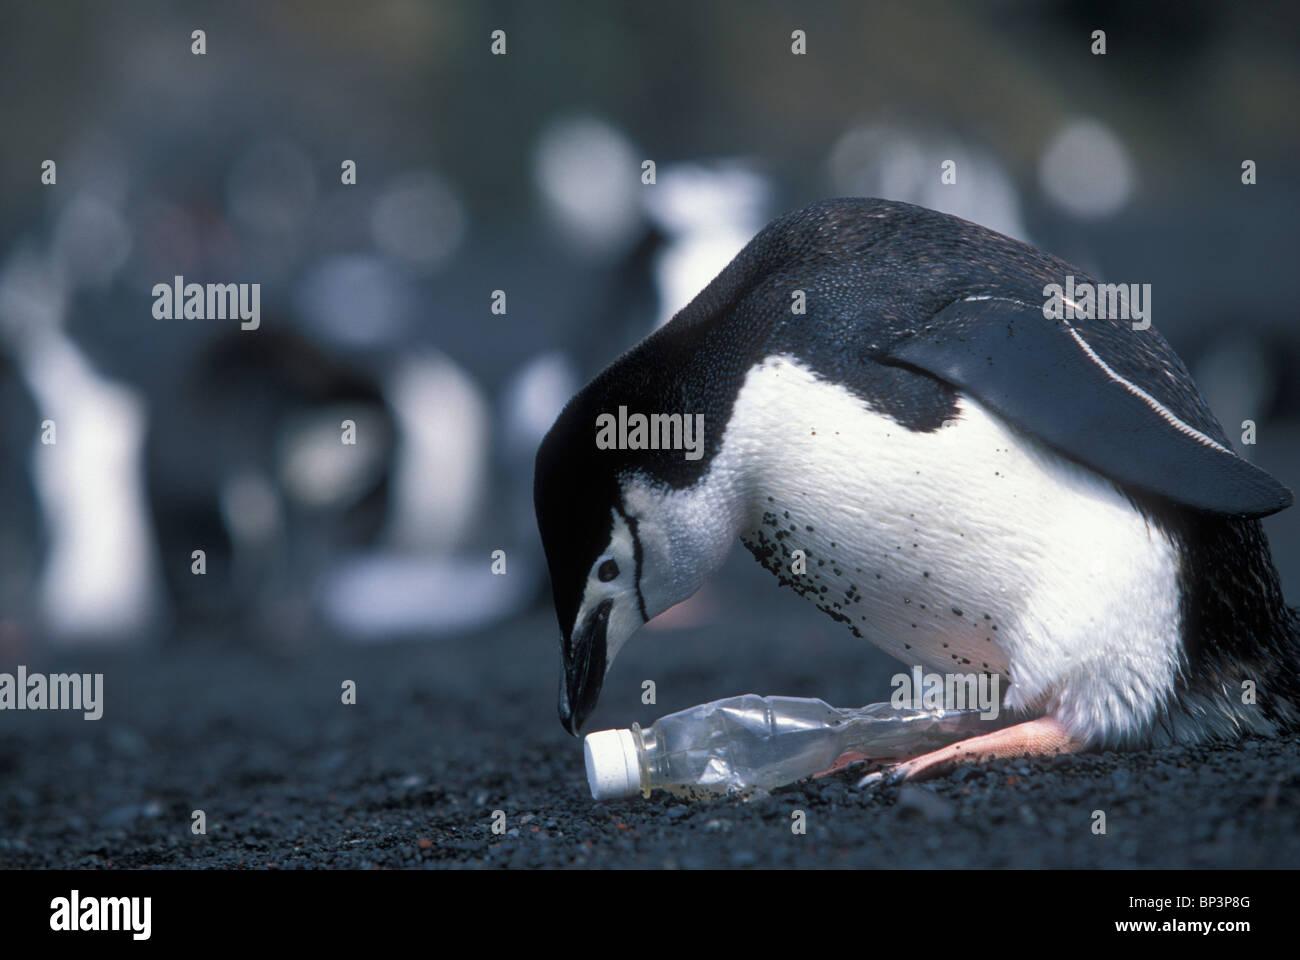 Antarctica, Deception Island, Chinstrap penguin (Pygoscelis antarctica) tries incubate plastic bottle left beach - Stock Image